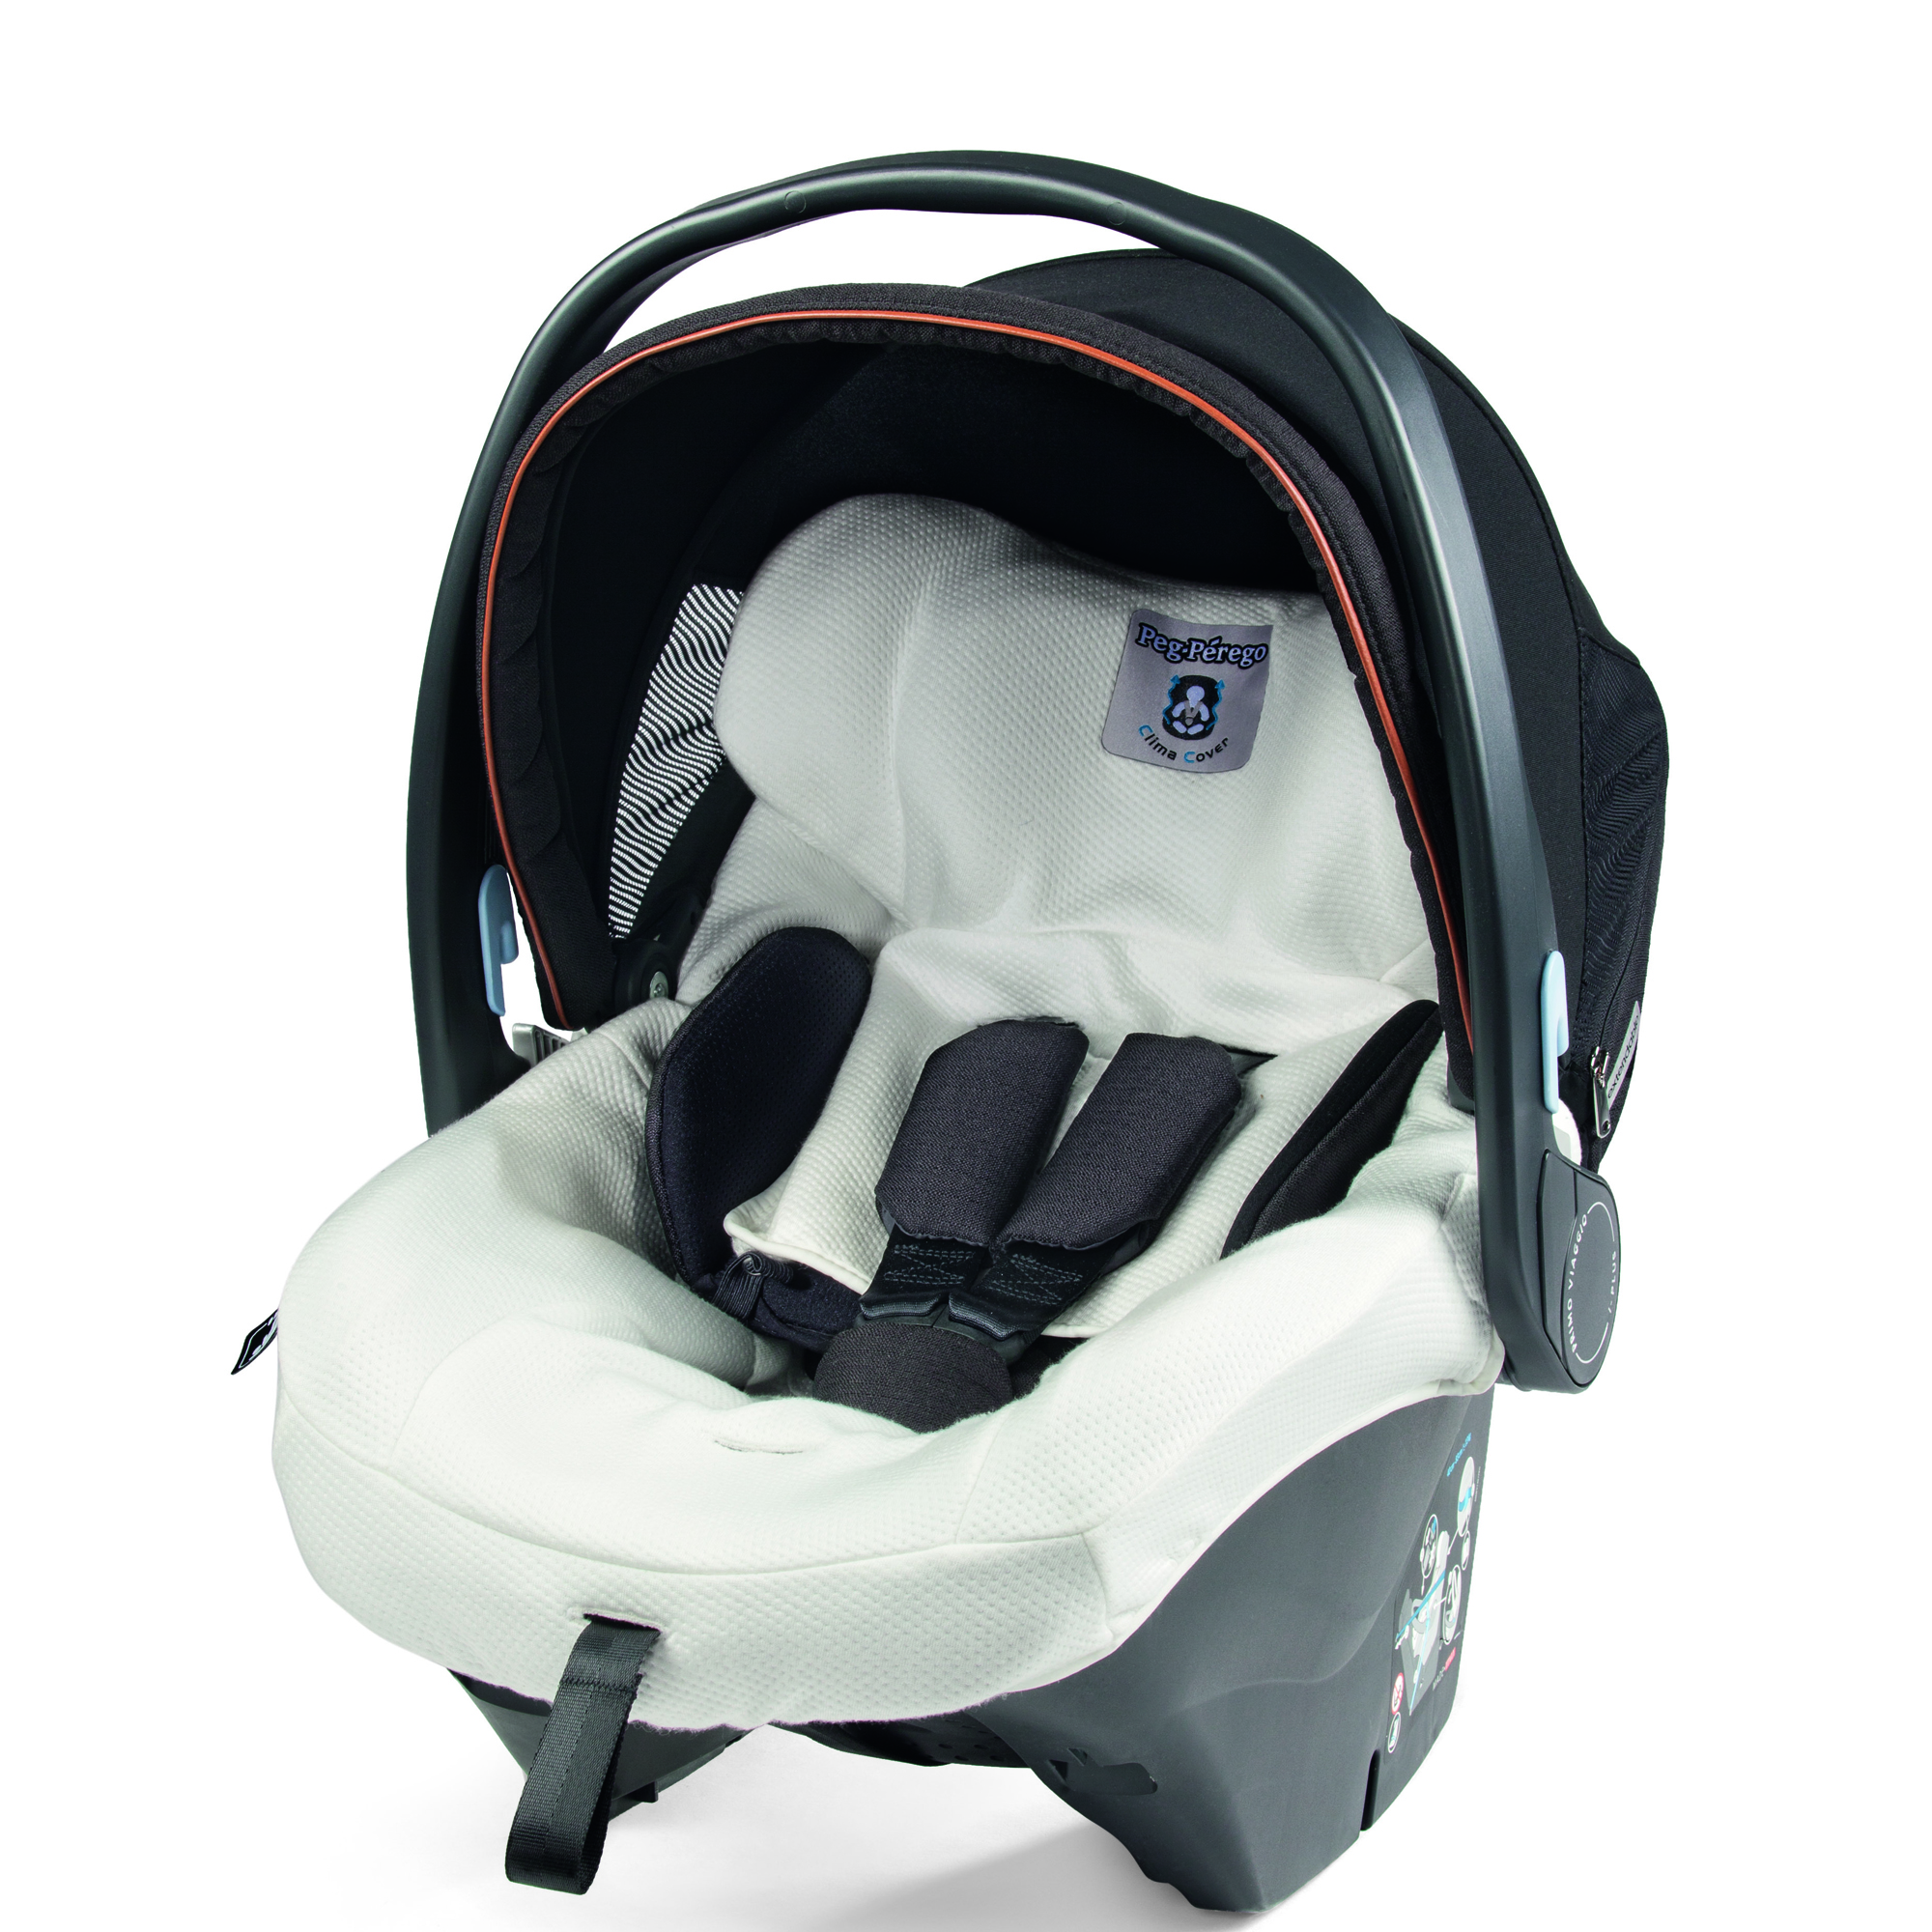 Husa Peg Perego Clima Cover pentru scaun auto Primoviaggio i-Size